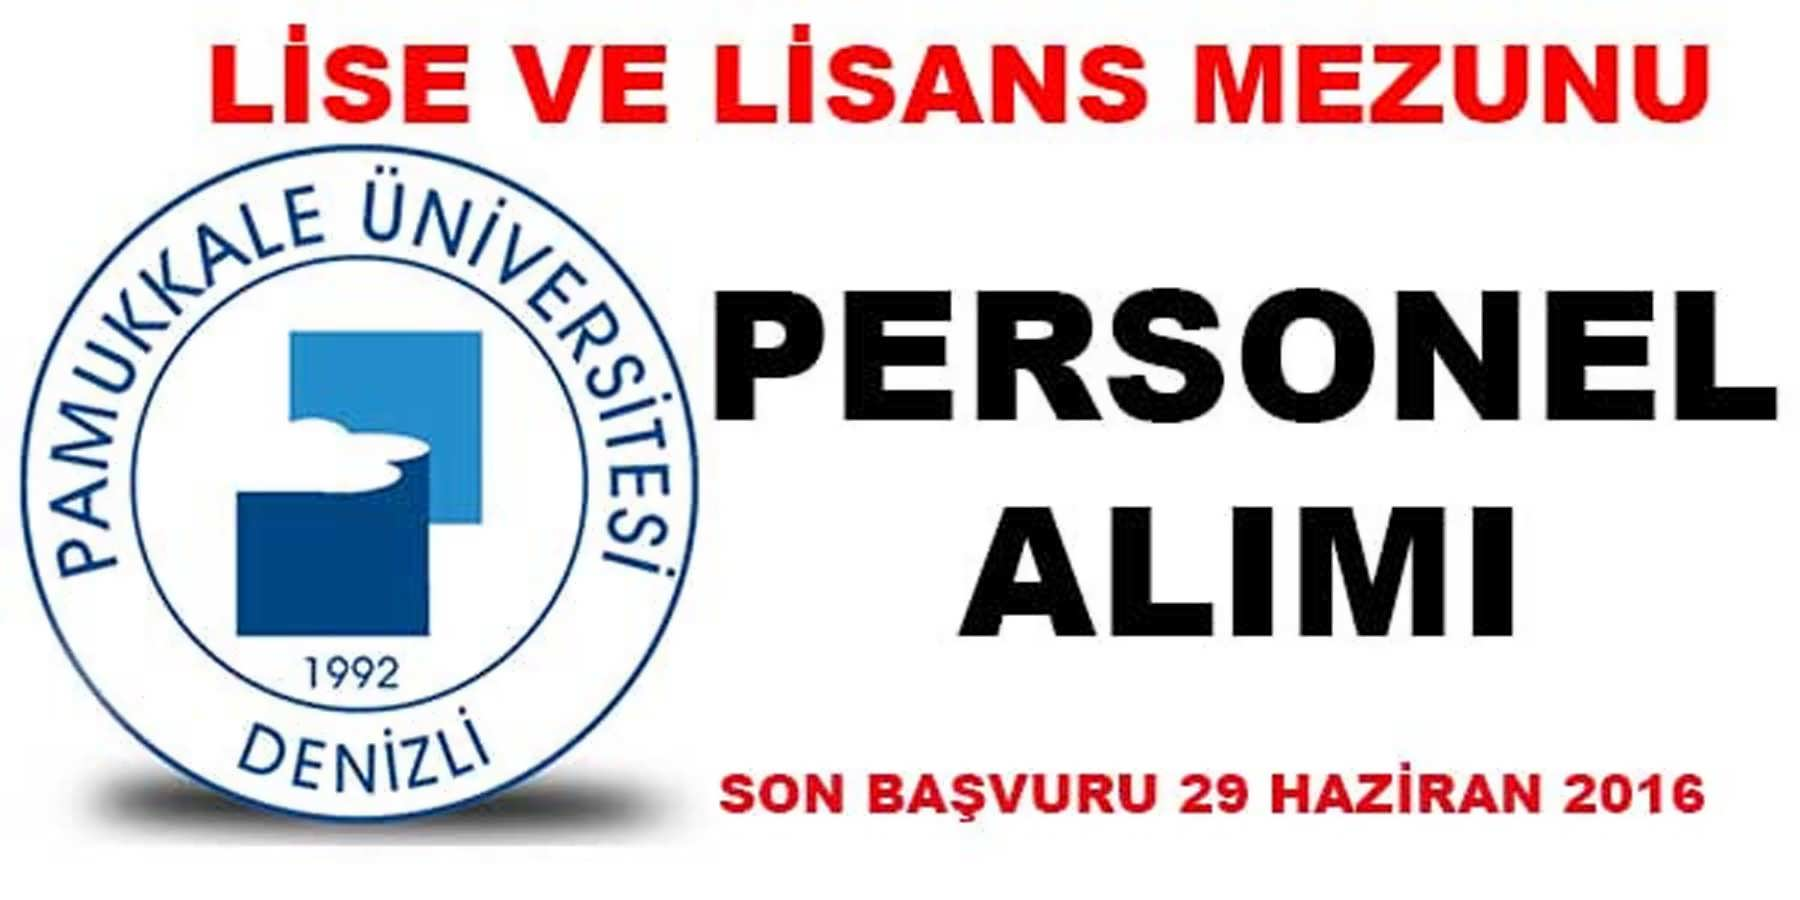 Pamukkale Üniversitesi Kamu Personeli Alımı